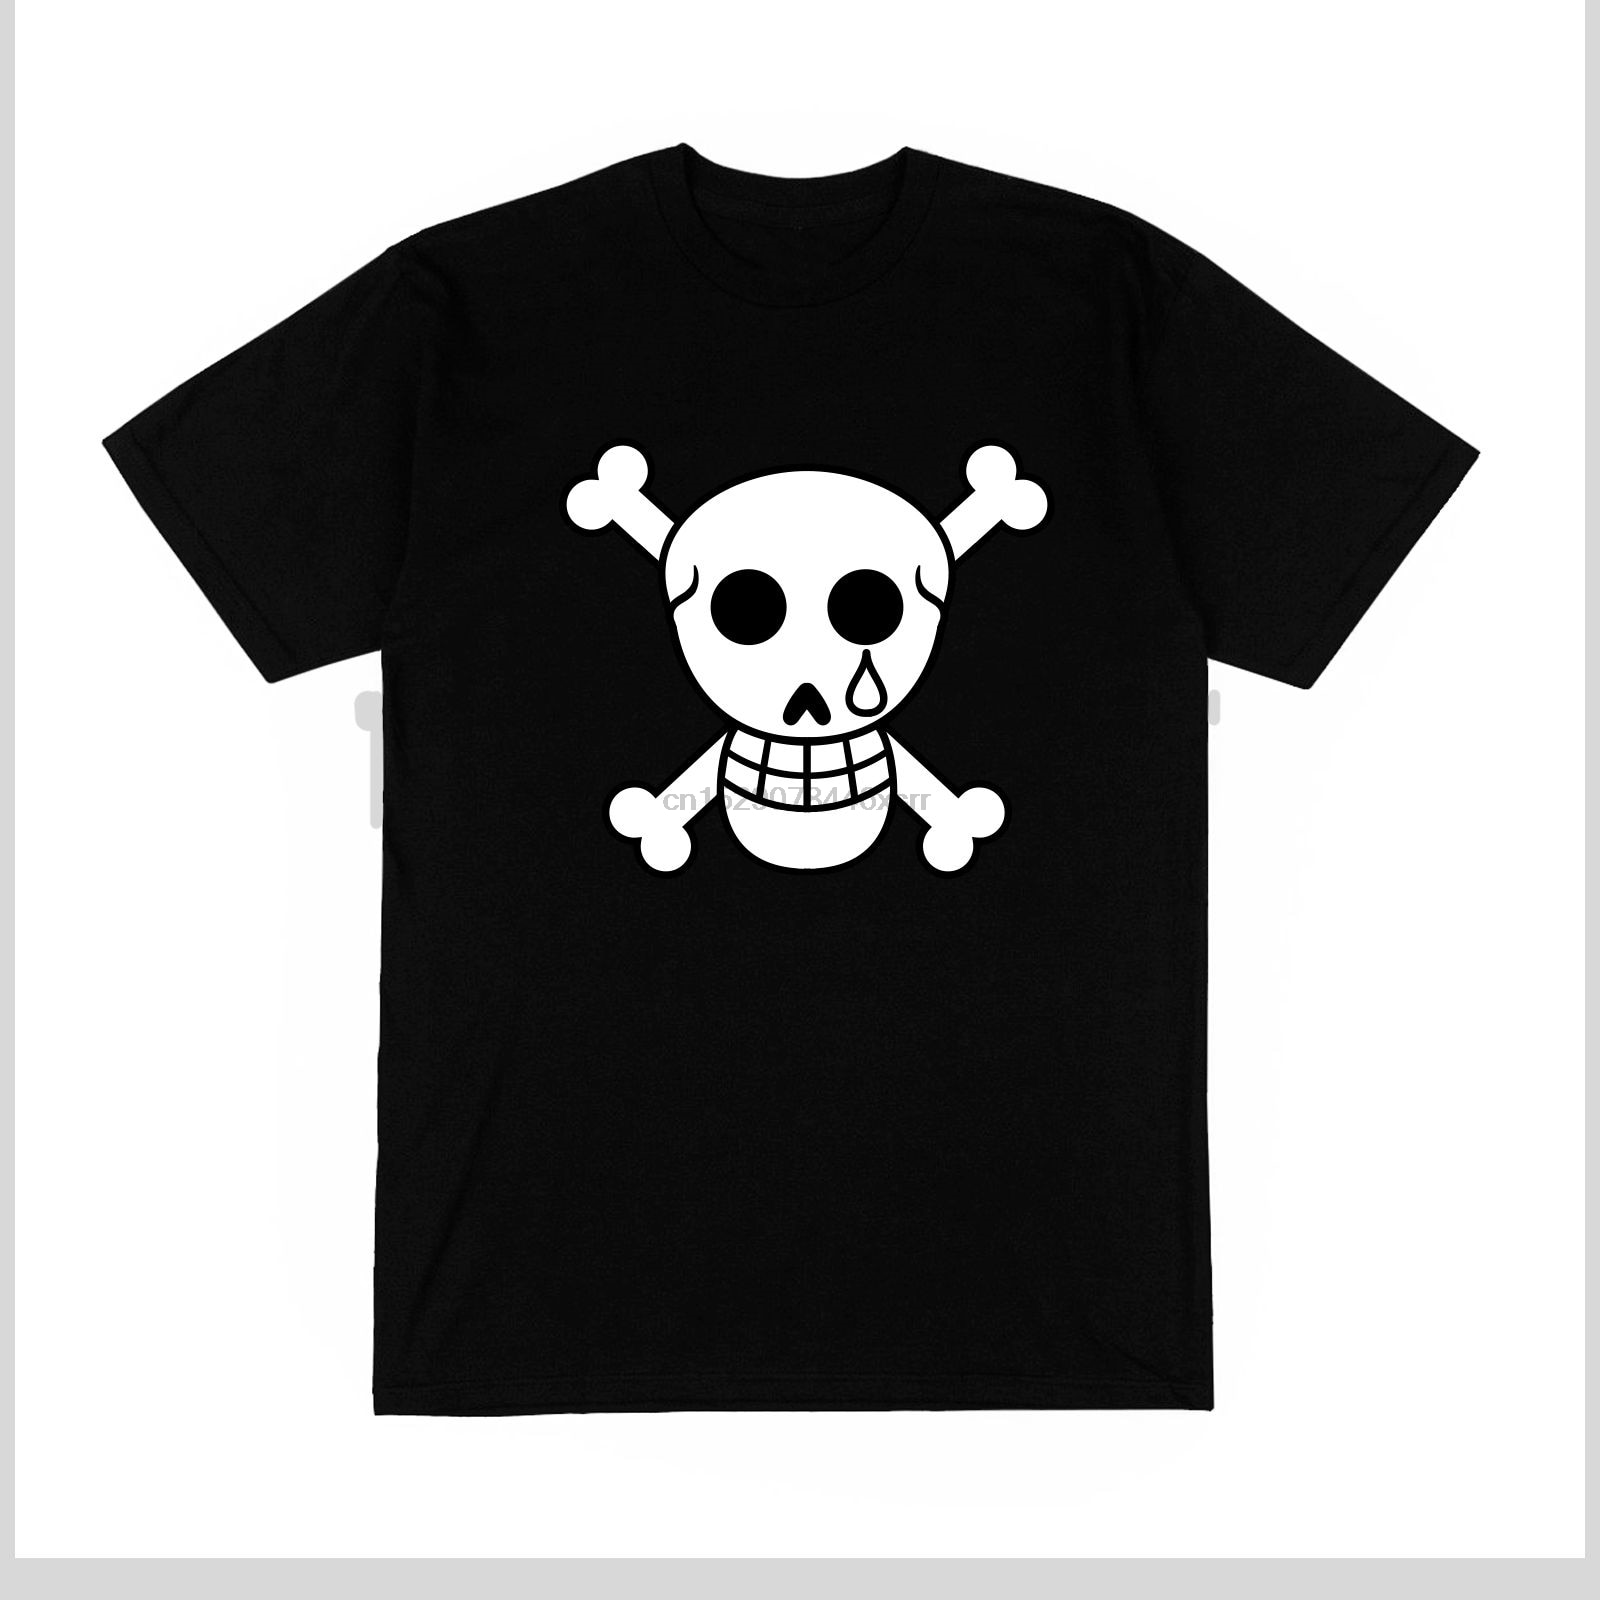 Camiseta para hombre Tete Crane Mort arme Qlf Pnl Rap Trap Francia Paris Mode Camiseta de algodón de alta calidad para hombre Camiseta de cuello redondo